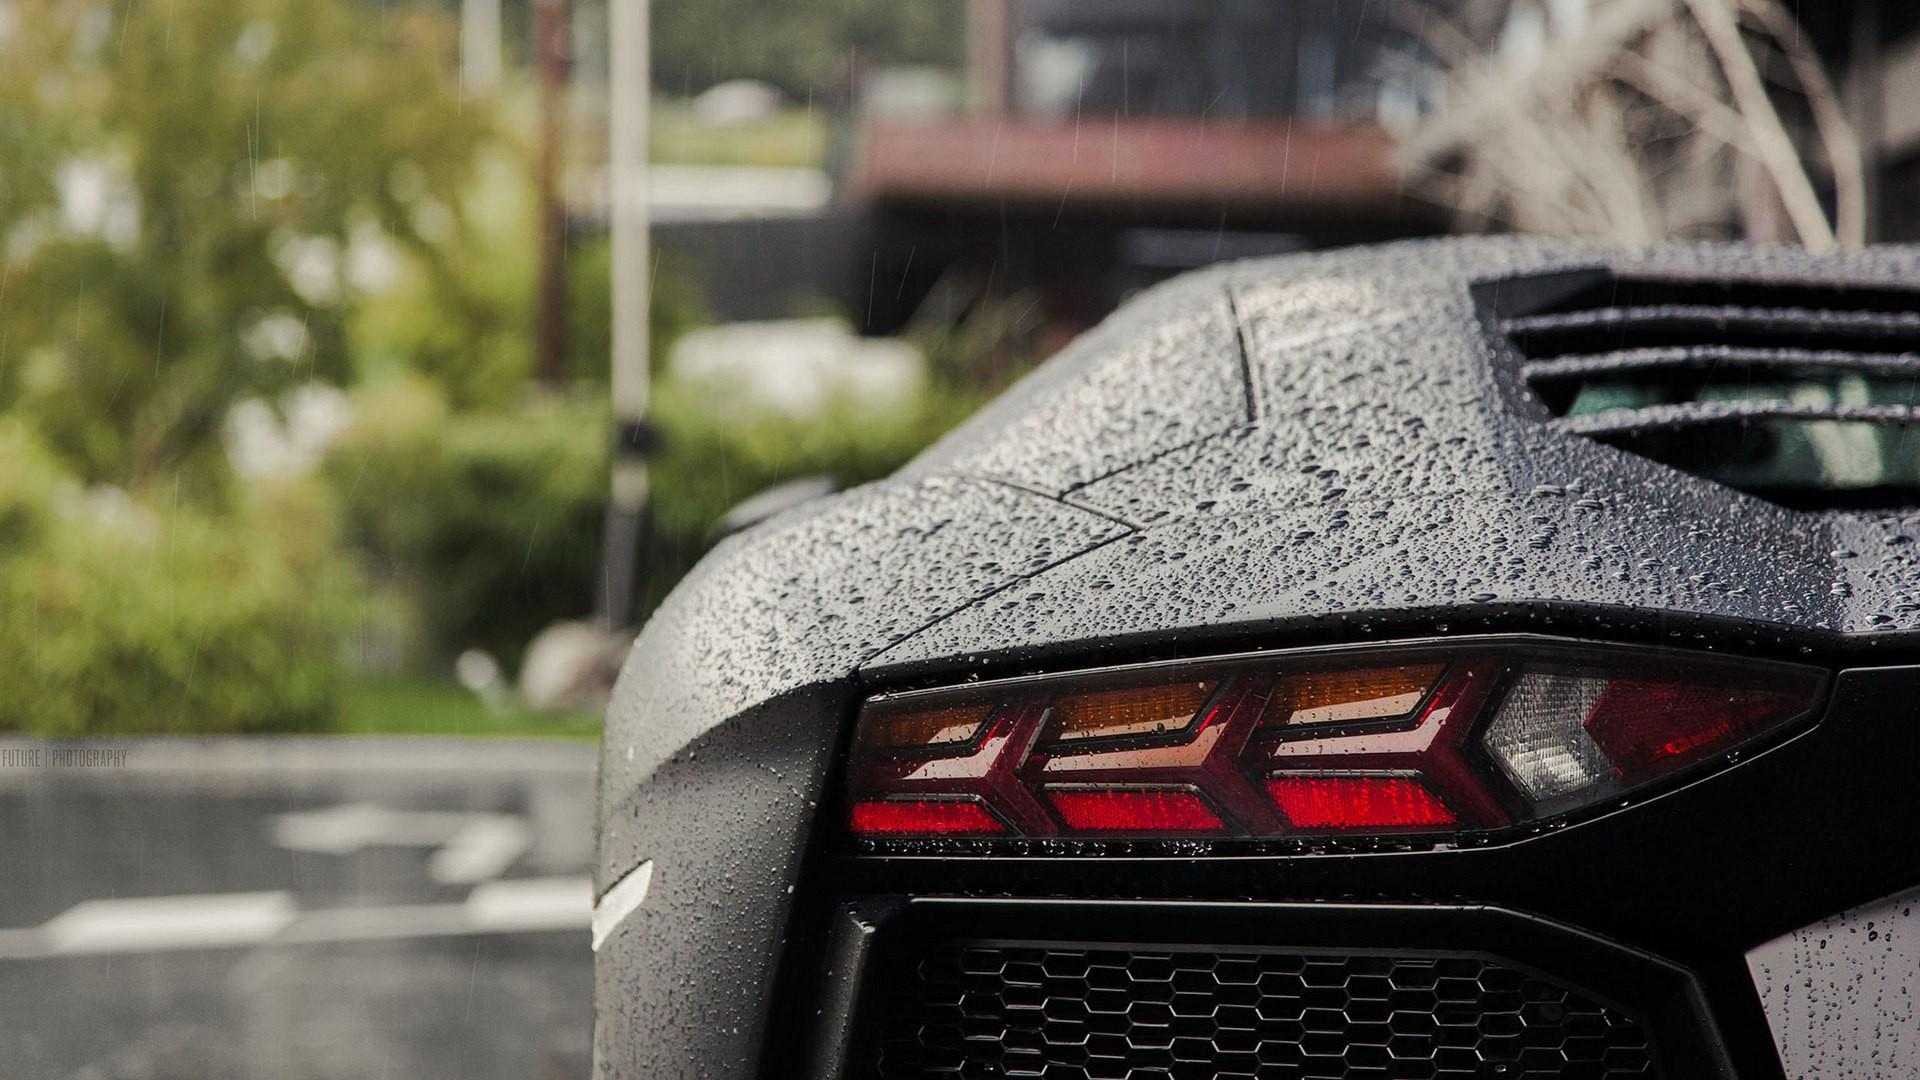 Wallpaper Rain Water Drops Lamborghini Aventador Black Cars Sports Car Performance 4 Wheel Supercar 1920x1080 Px Land Vehicle